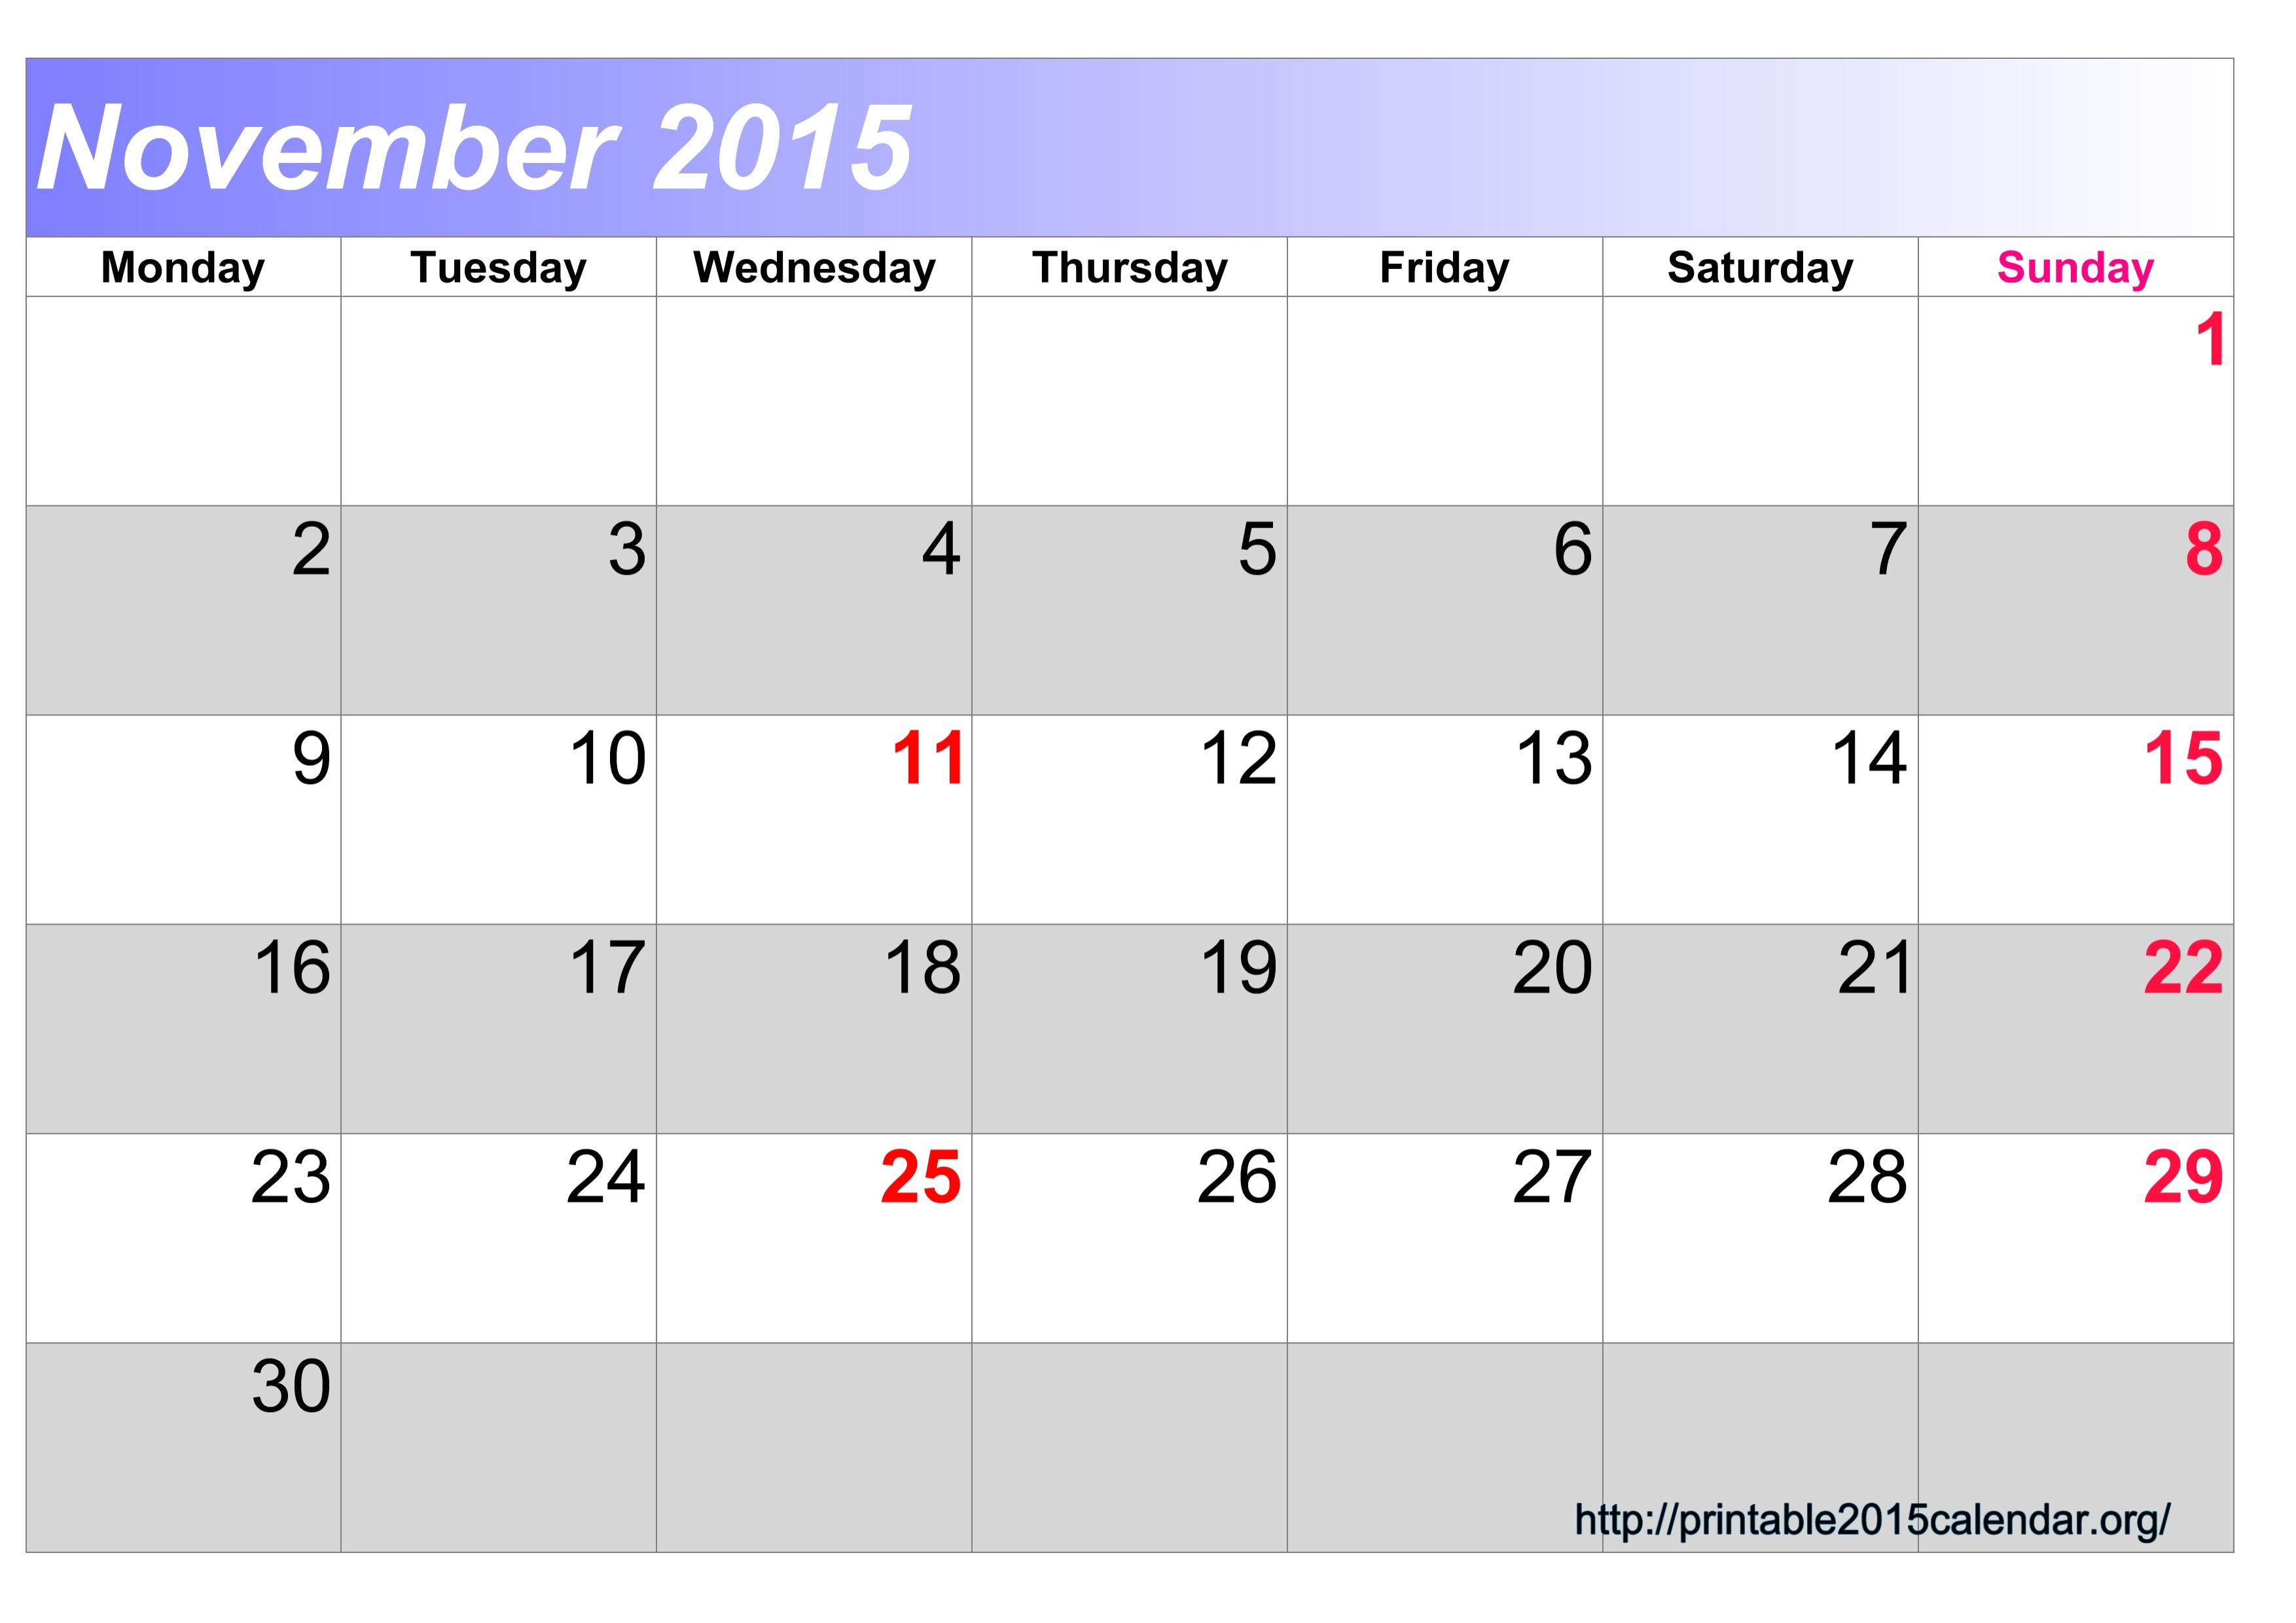 November 2015 Calendar Printable 8 X 10